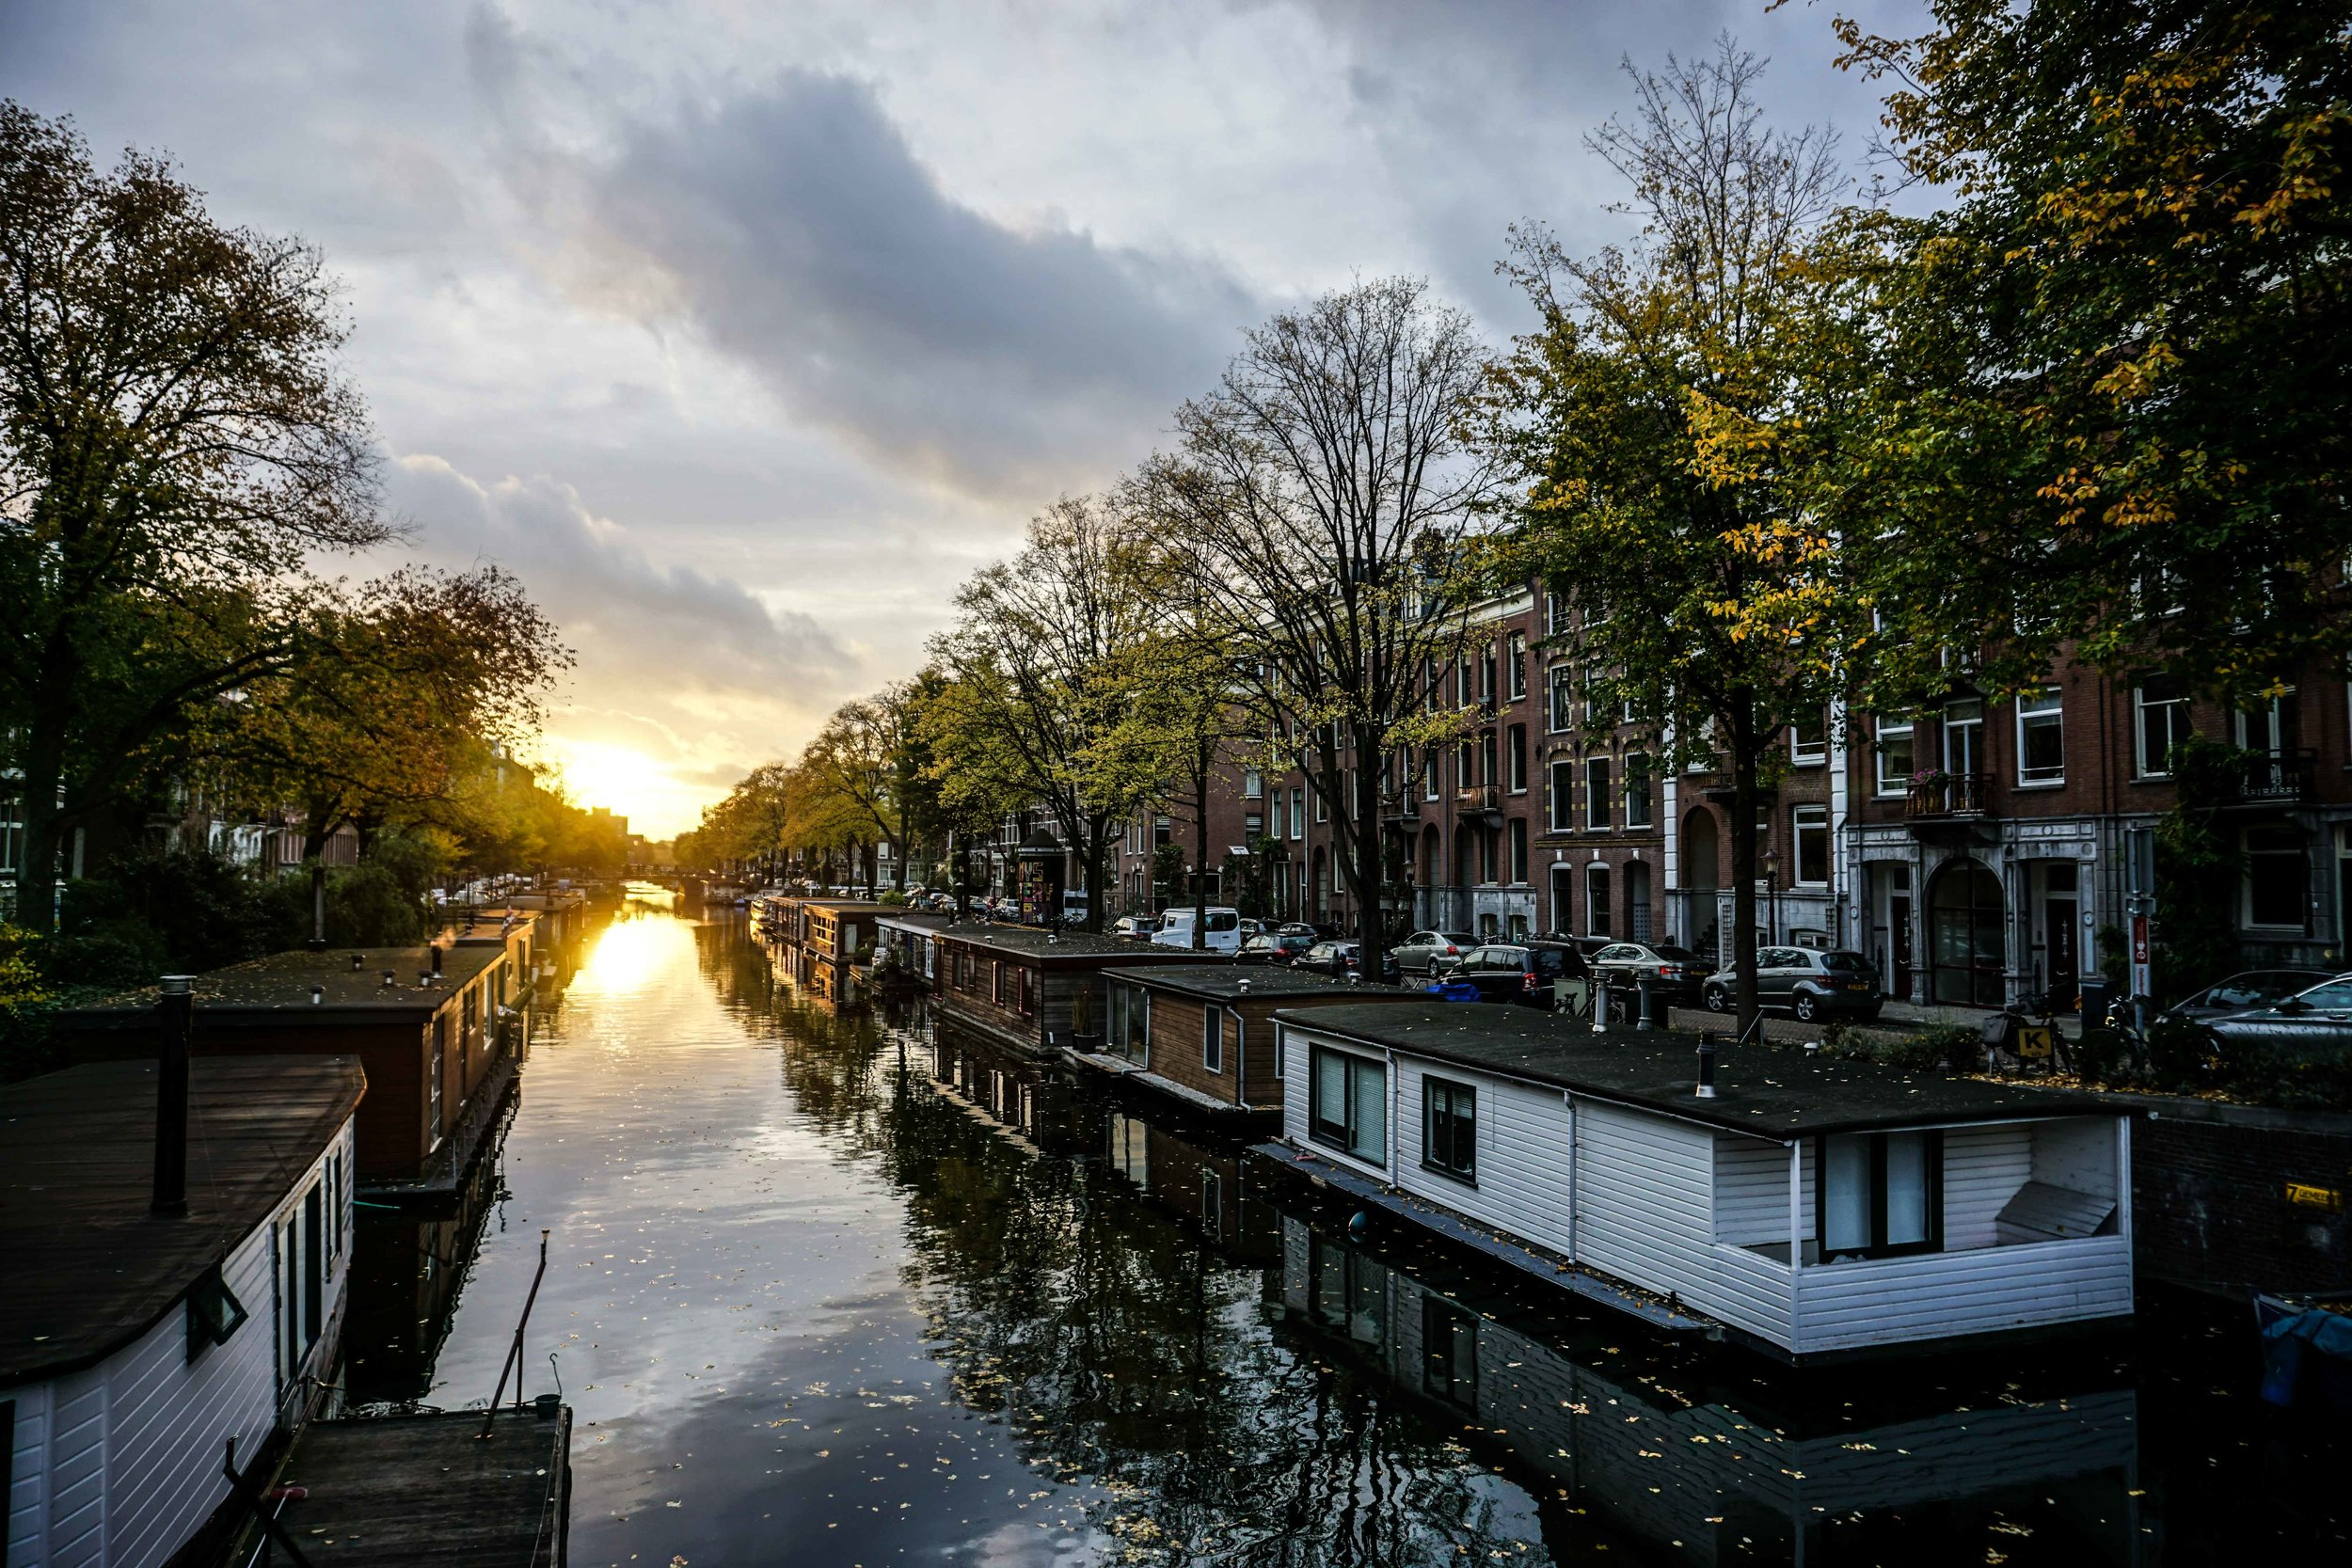 Amsterdam-02436.jpg